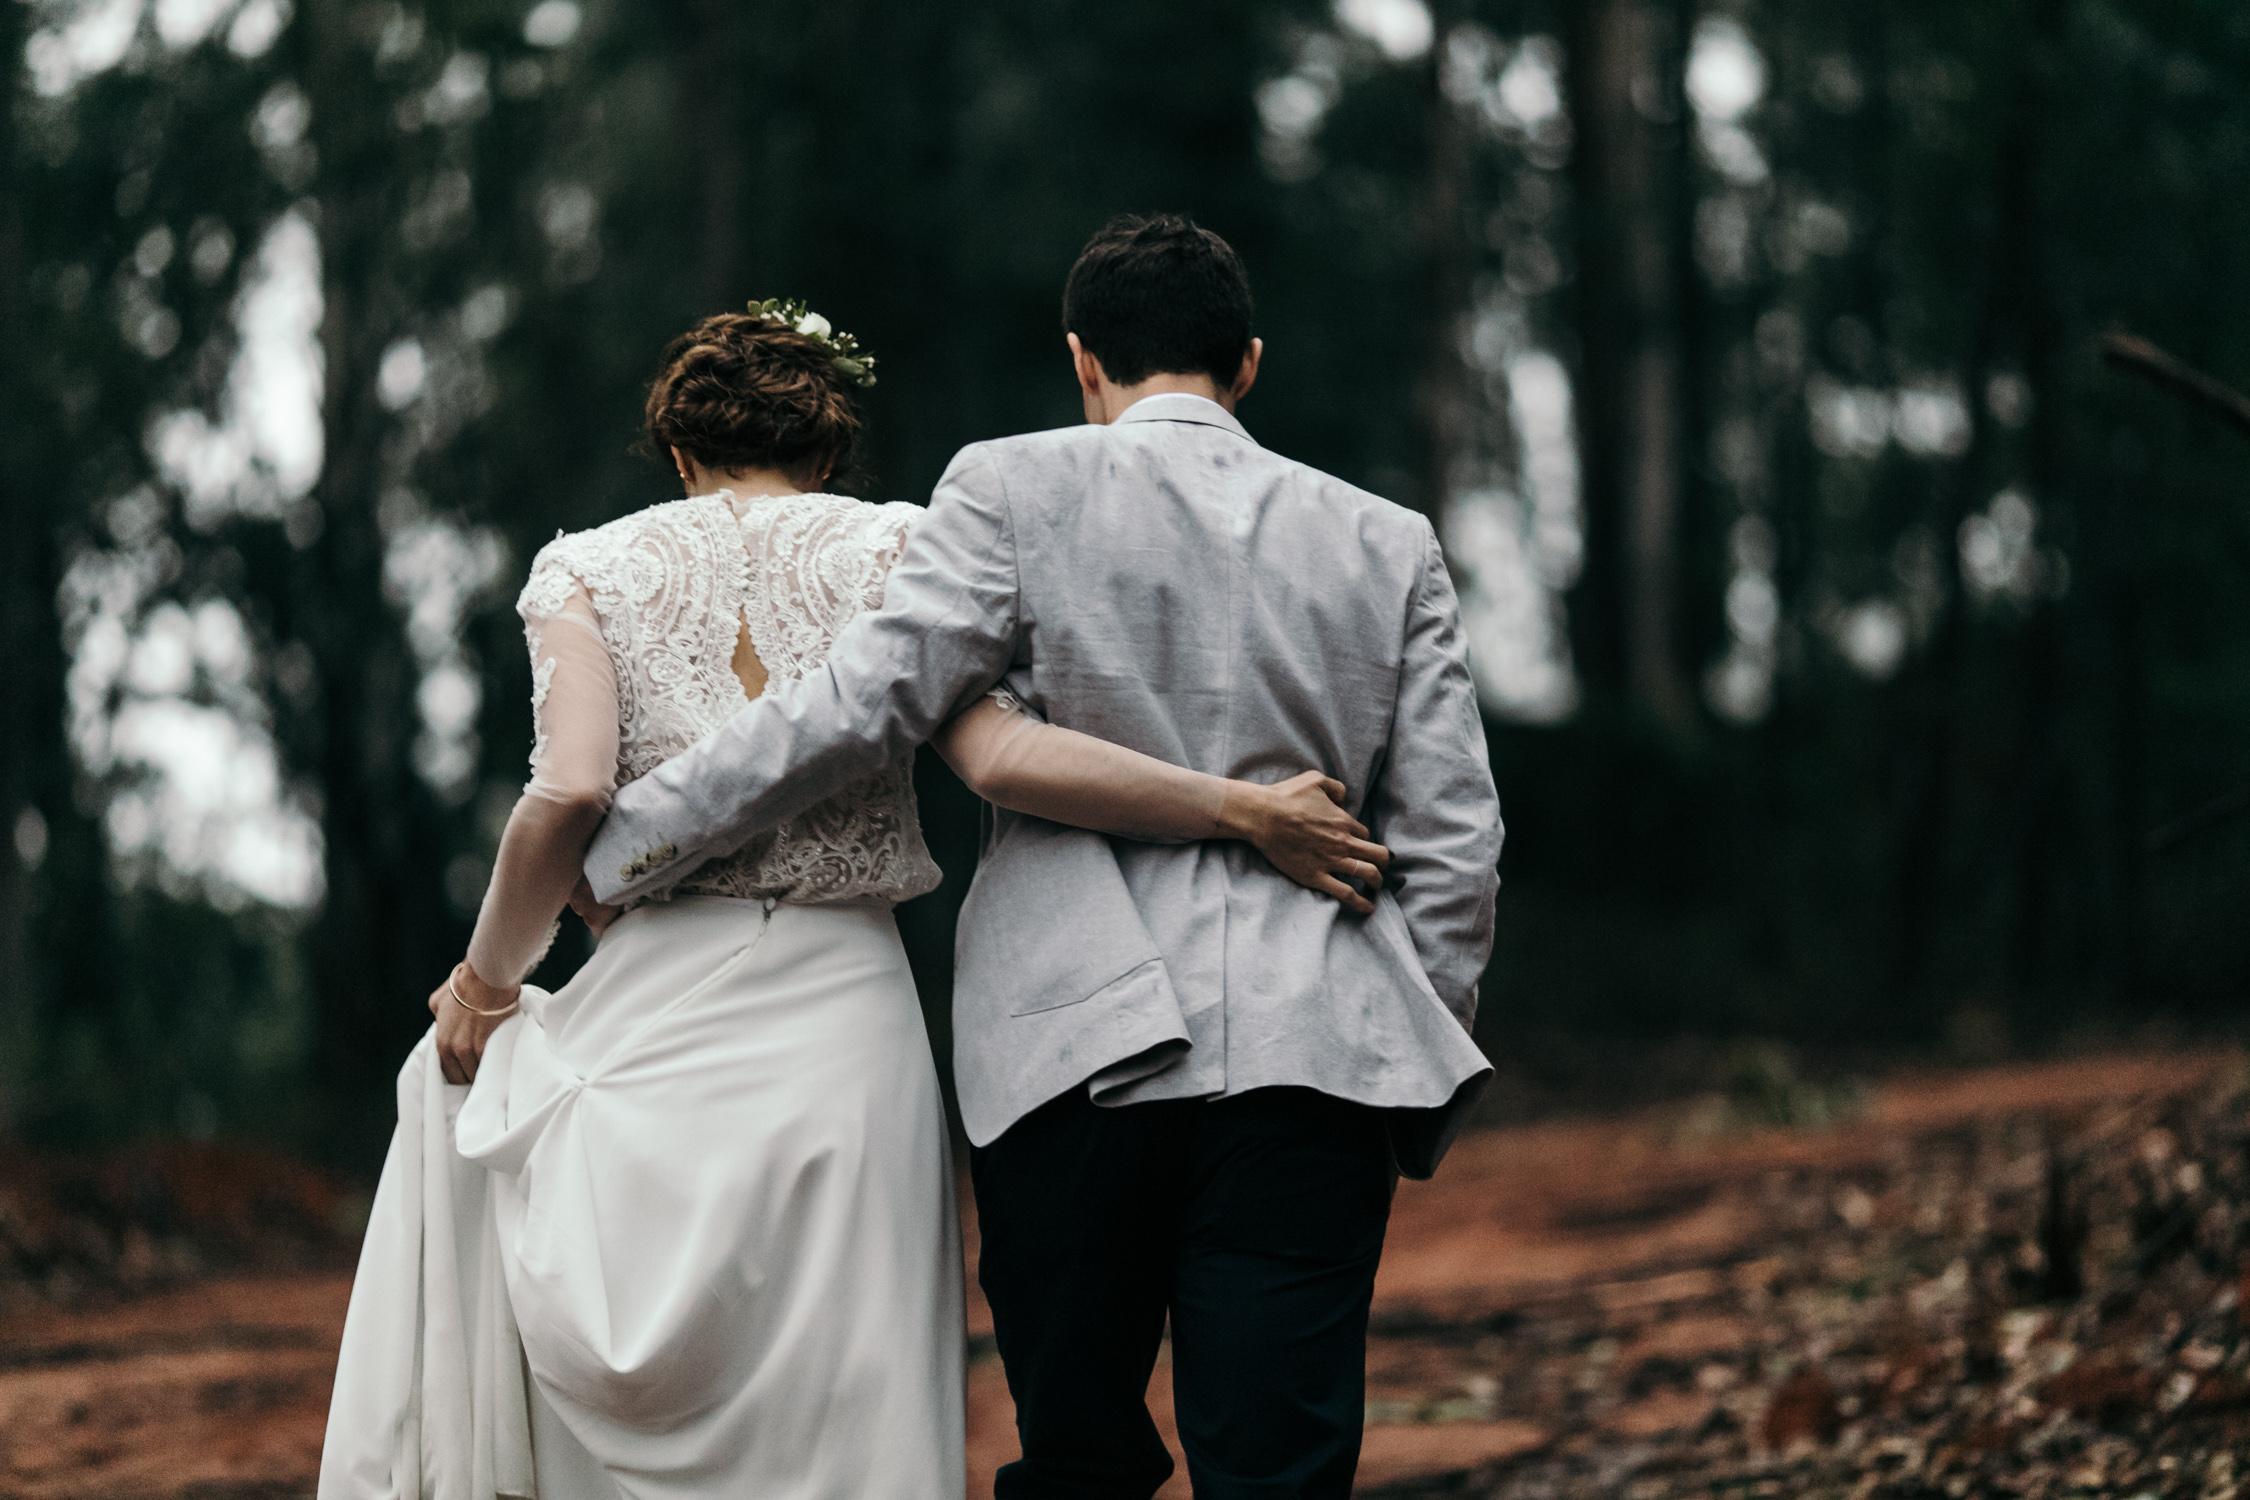 heisvisual-wedding-photographers-documentary-midlands-south-africa115.jpg